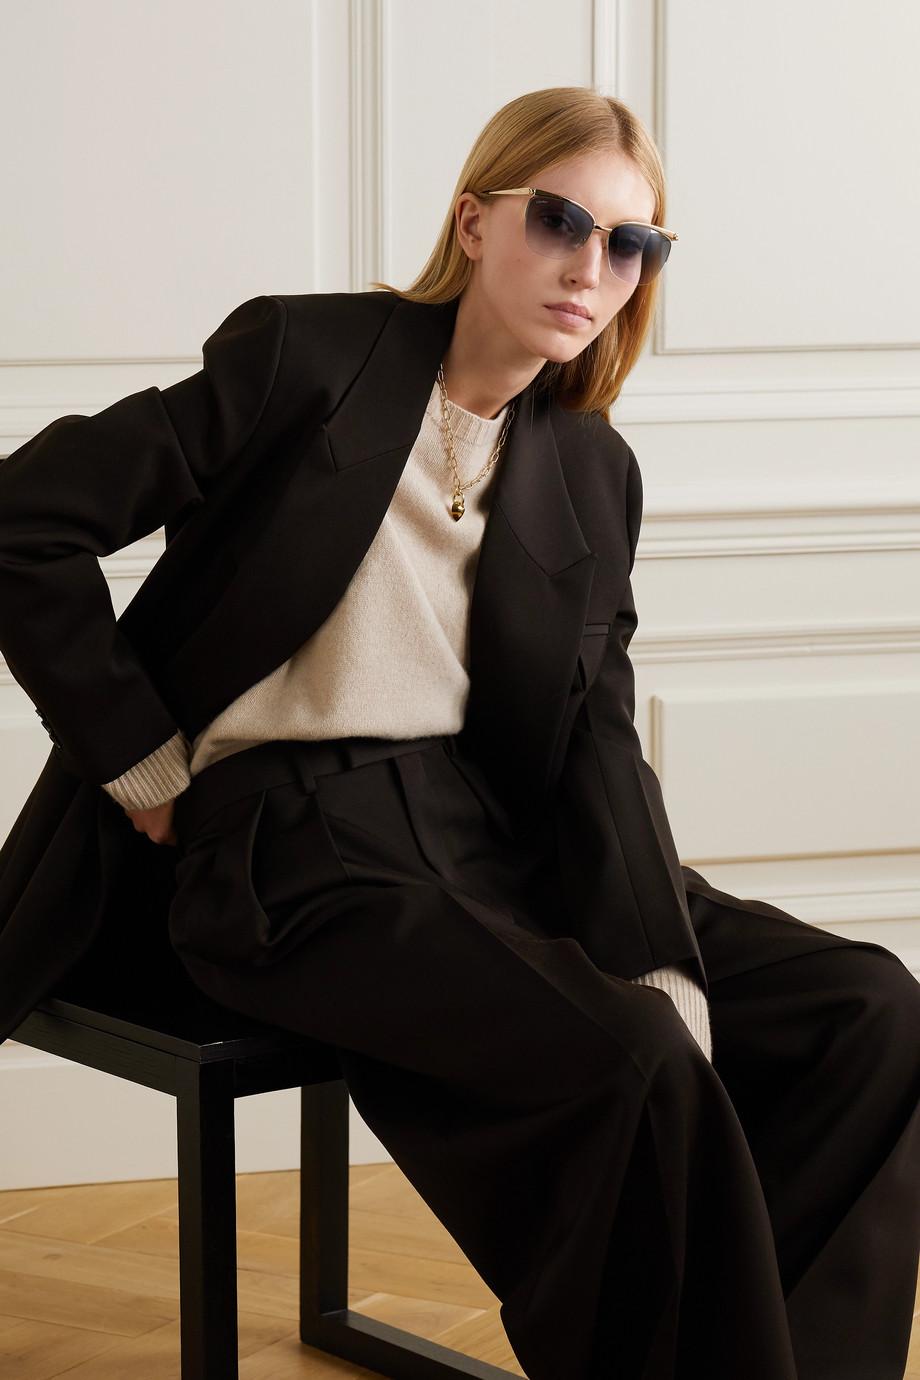 Cartier Eyewear 金色金属猫眼太阳镜